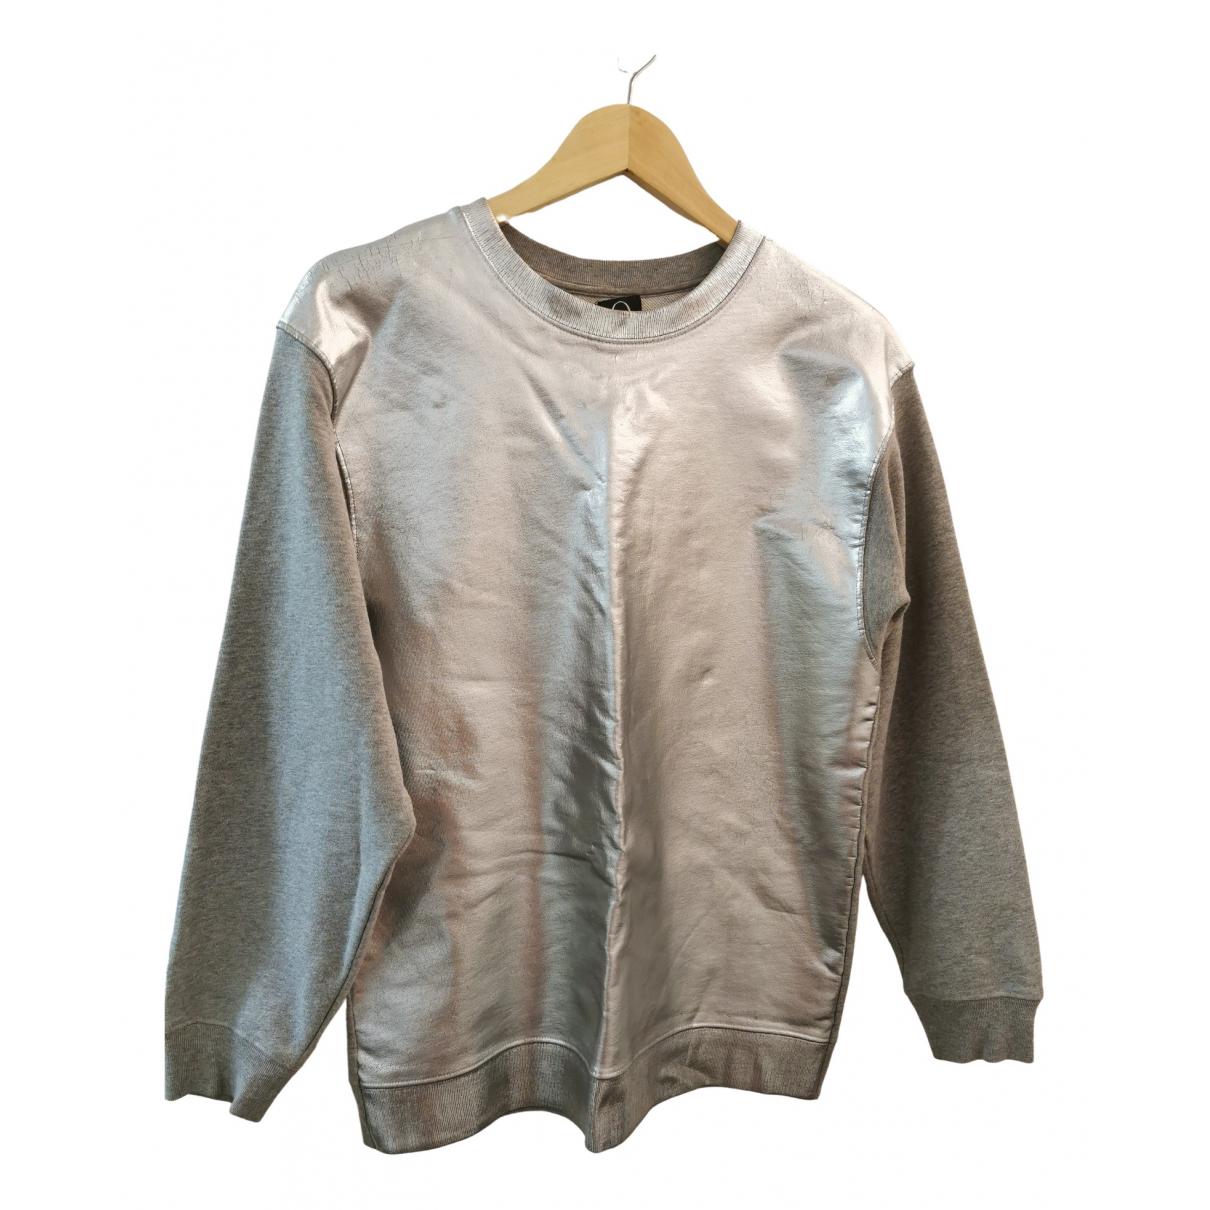 Mcq N Metallic Cotton  top for Women M International